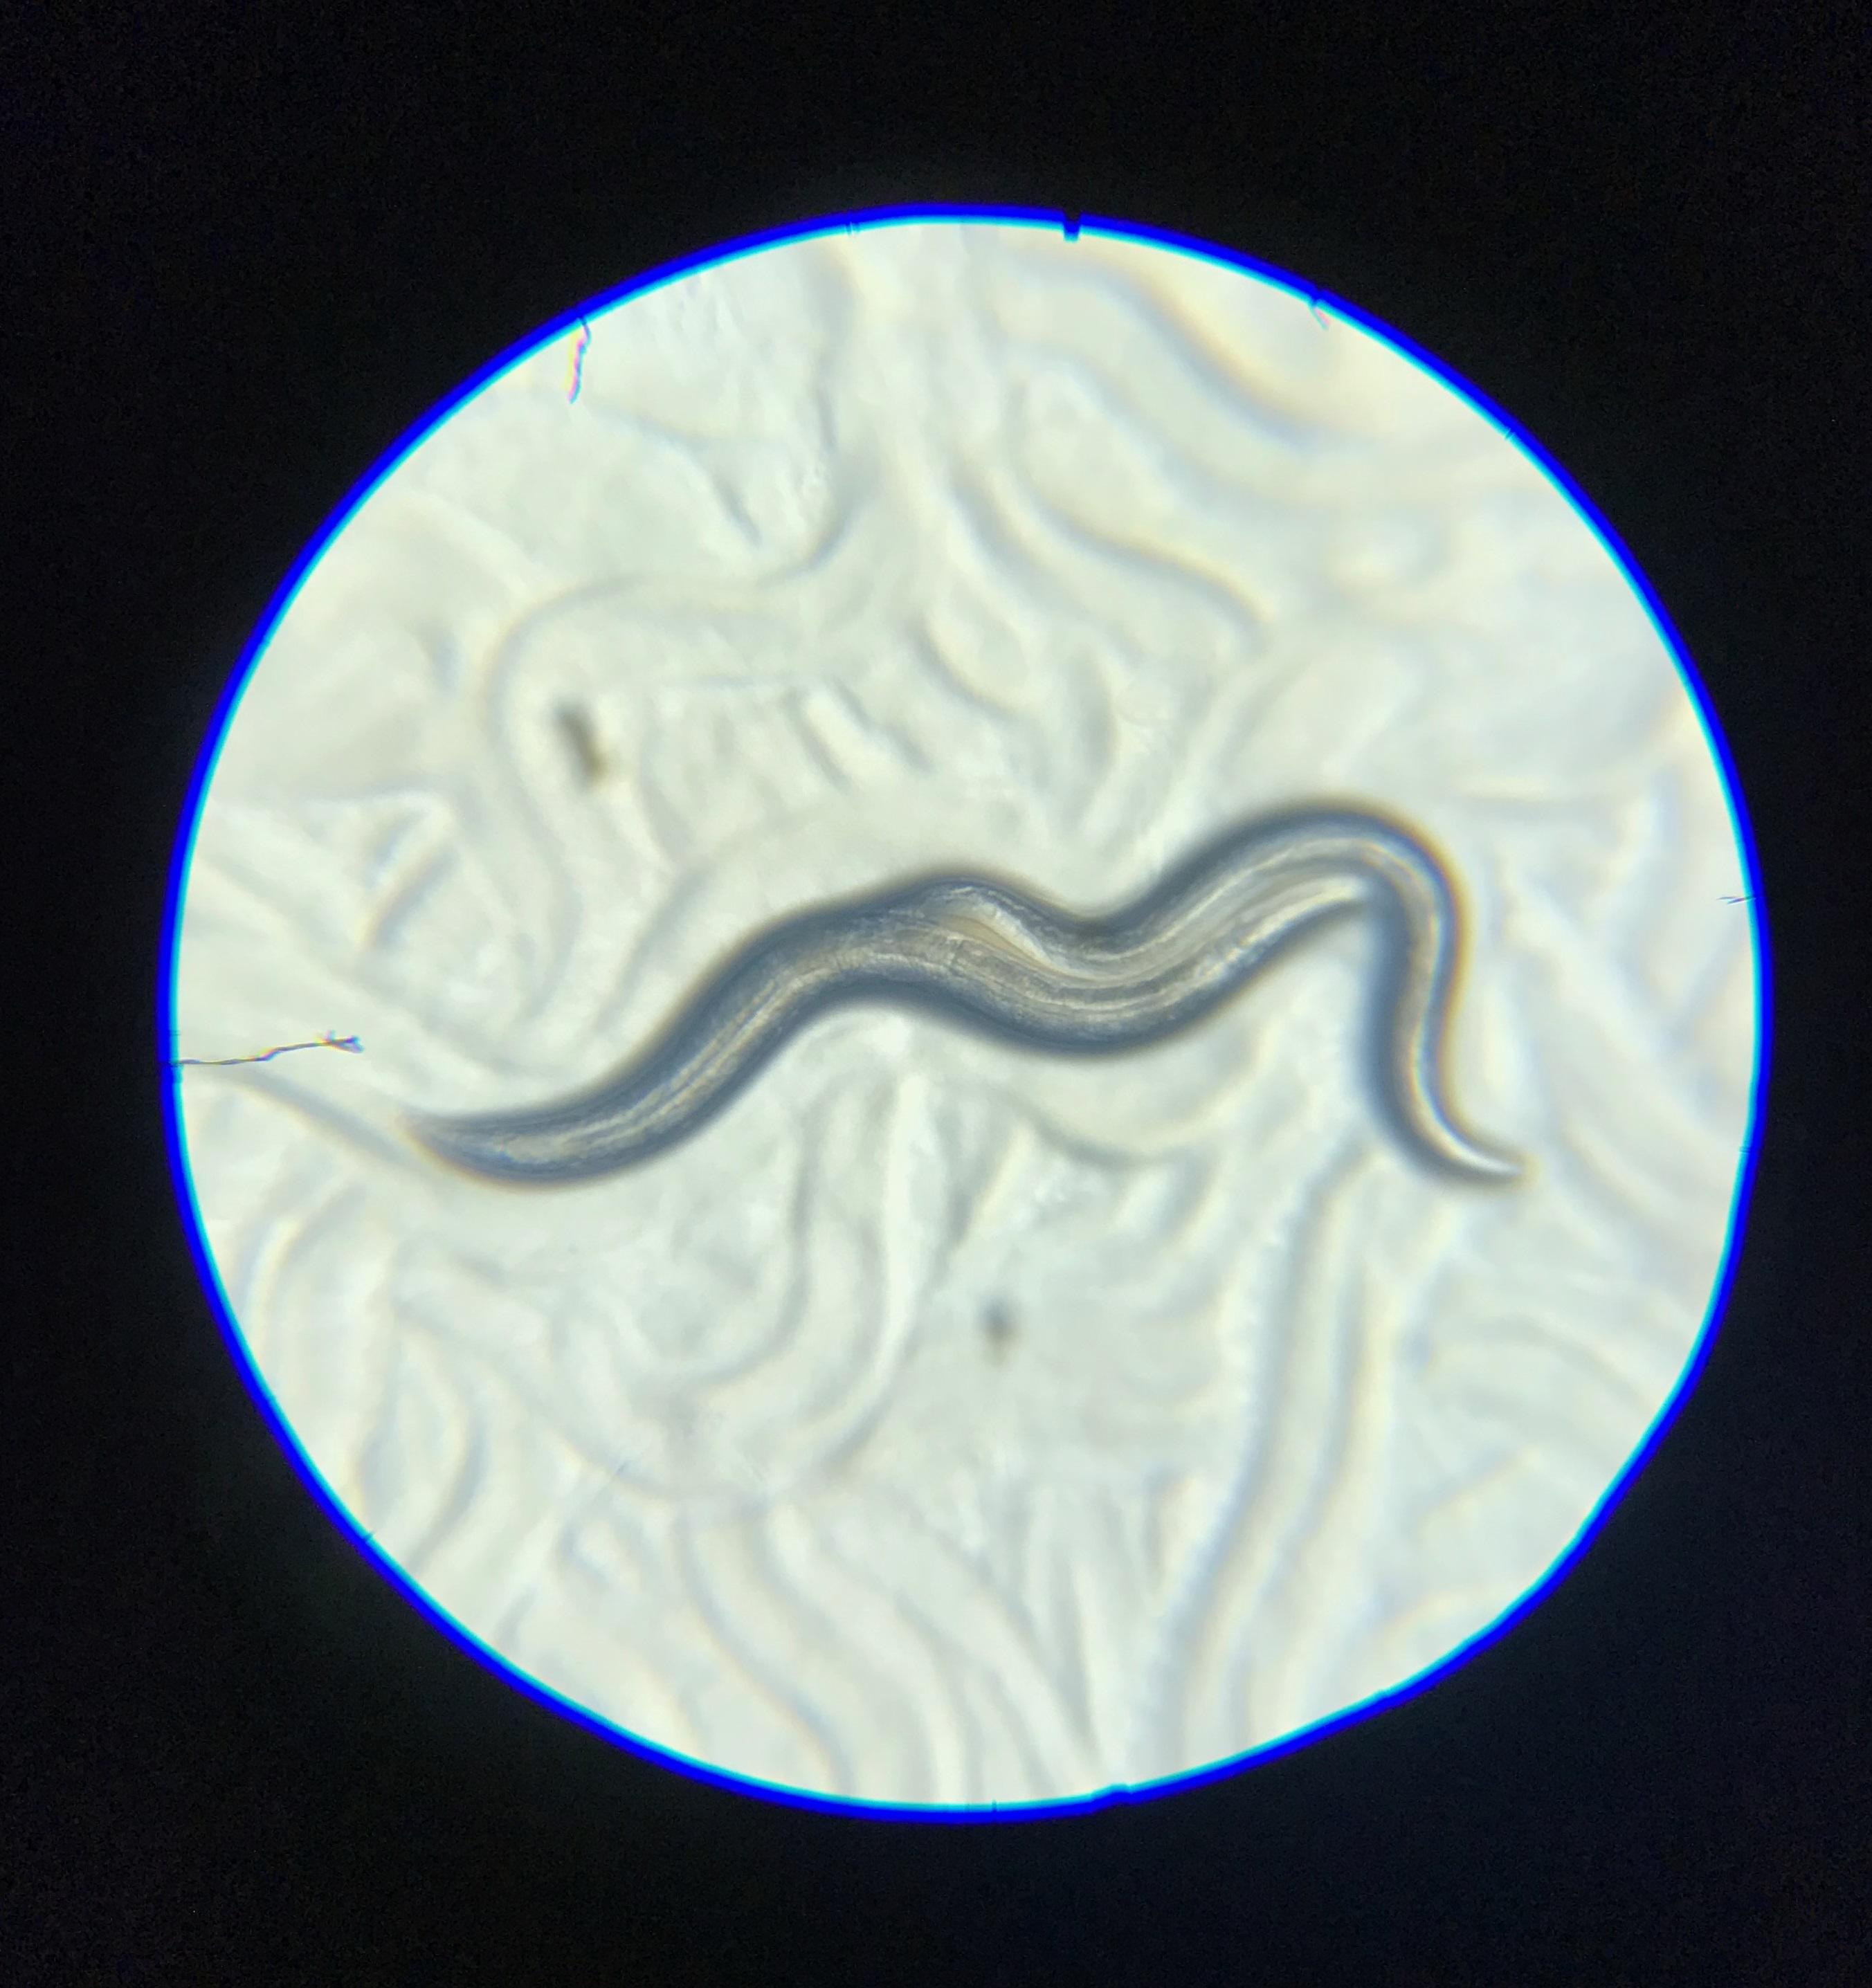 organismele bazate pe sol sunt parazite